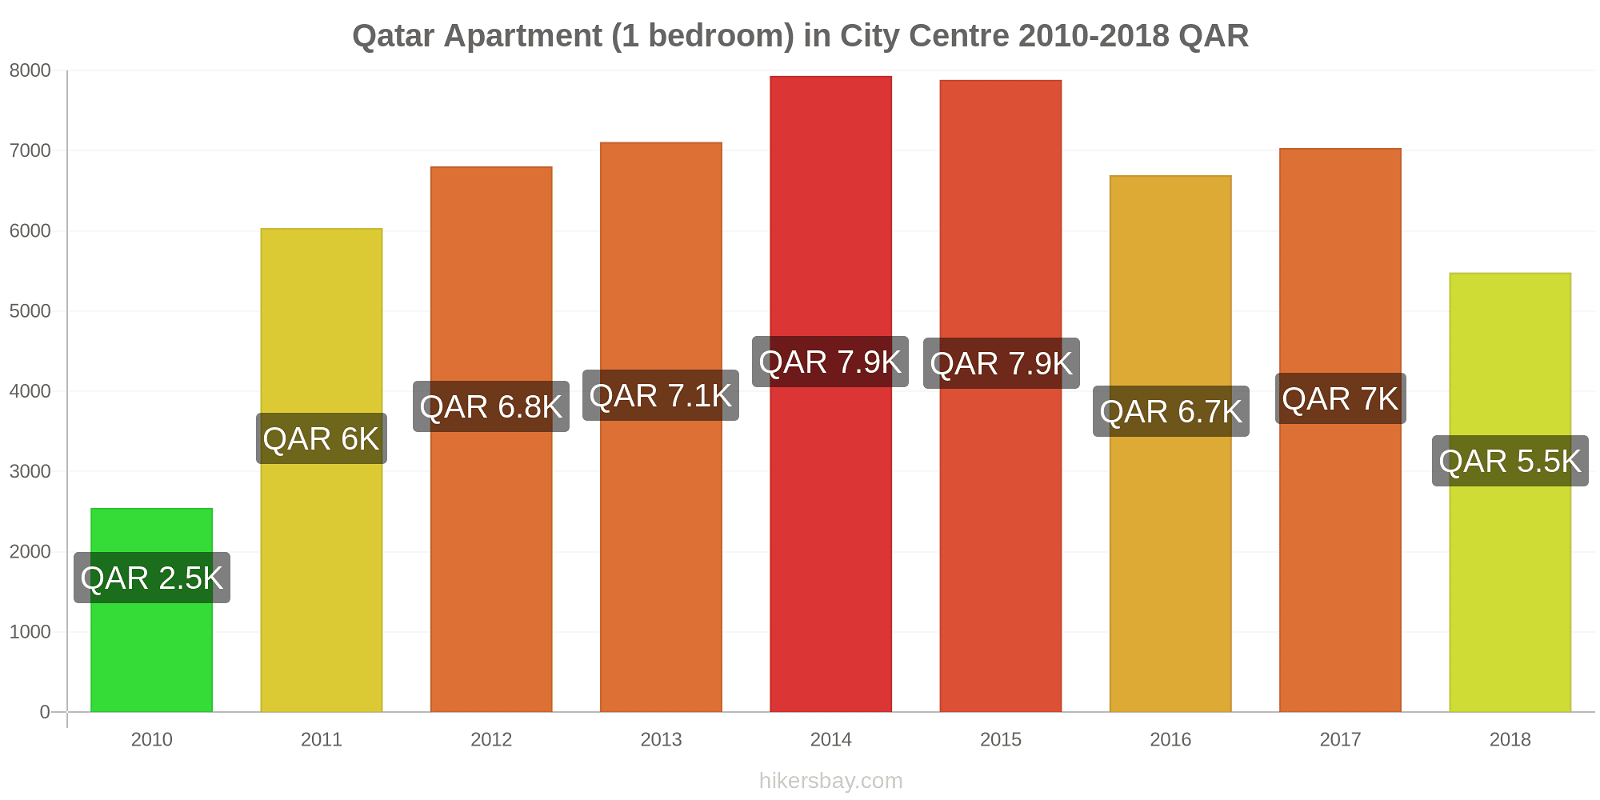 Qatar price changes Apartment (1 bedroom) in City Centre hikersbay.com